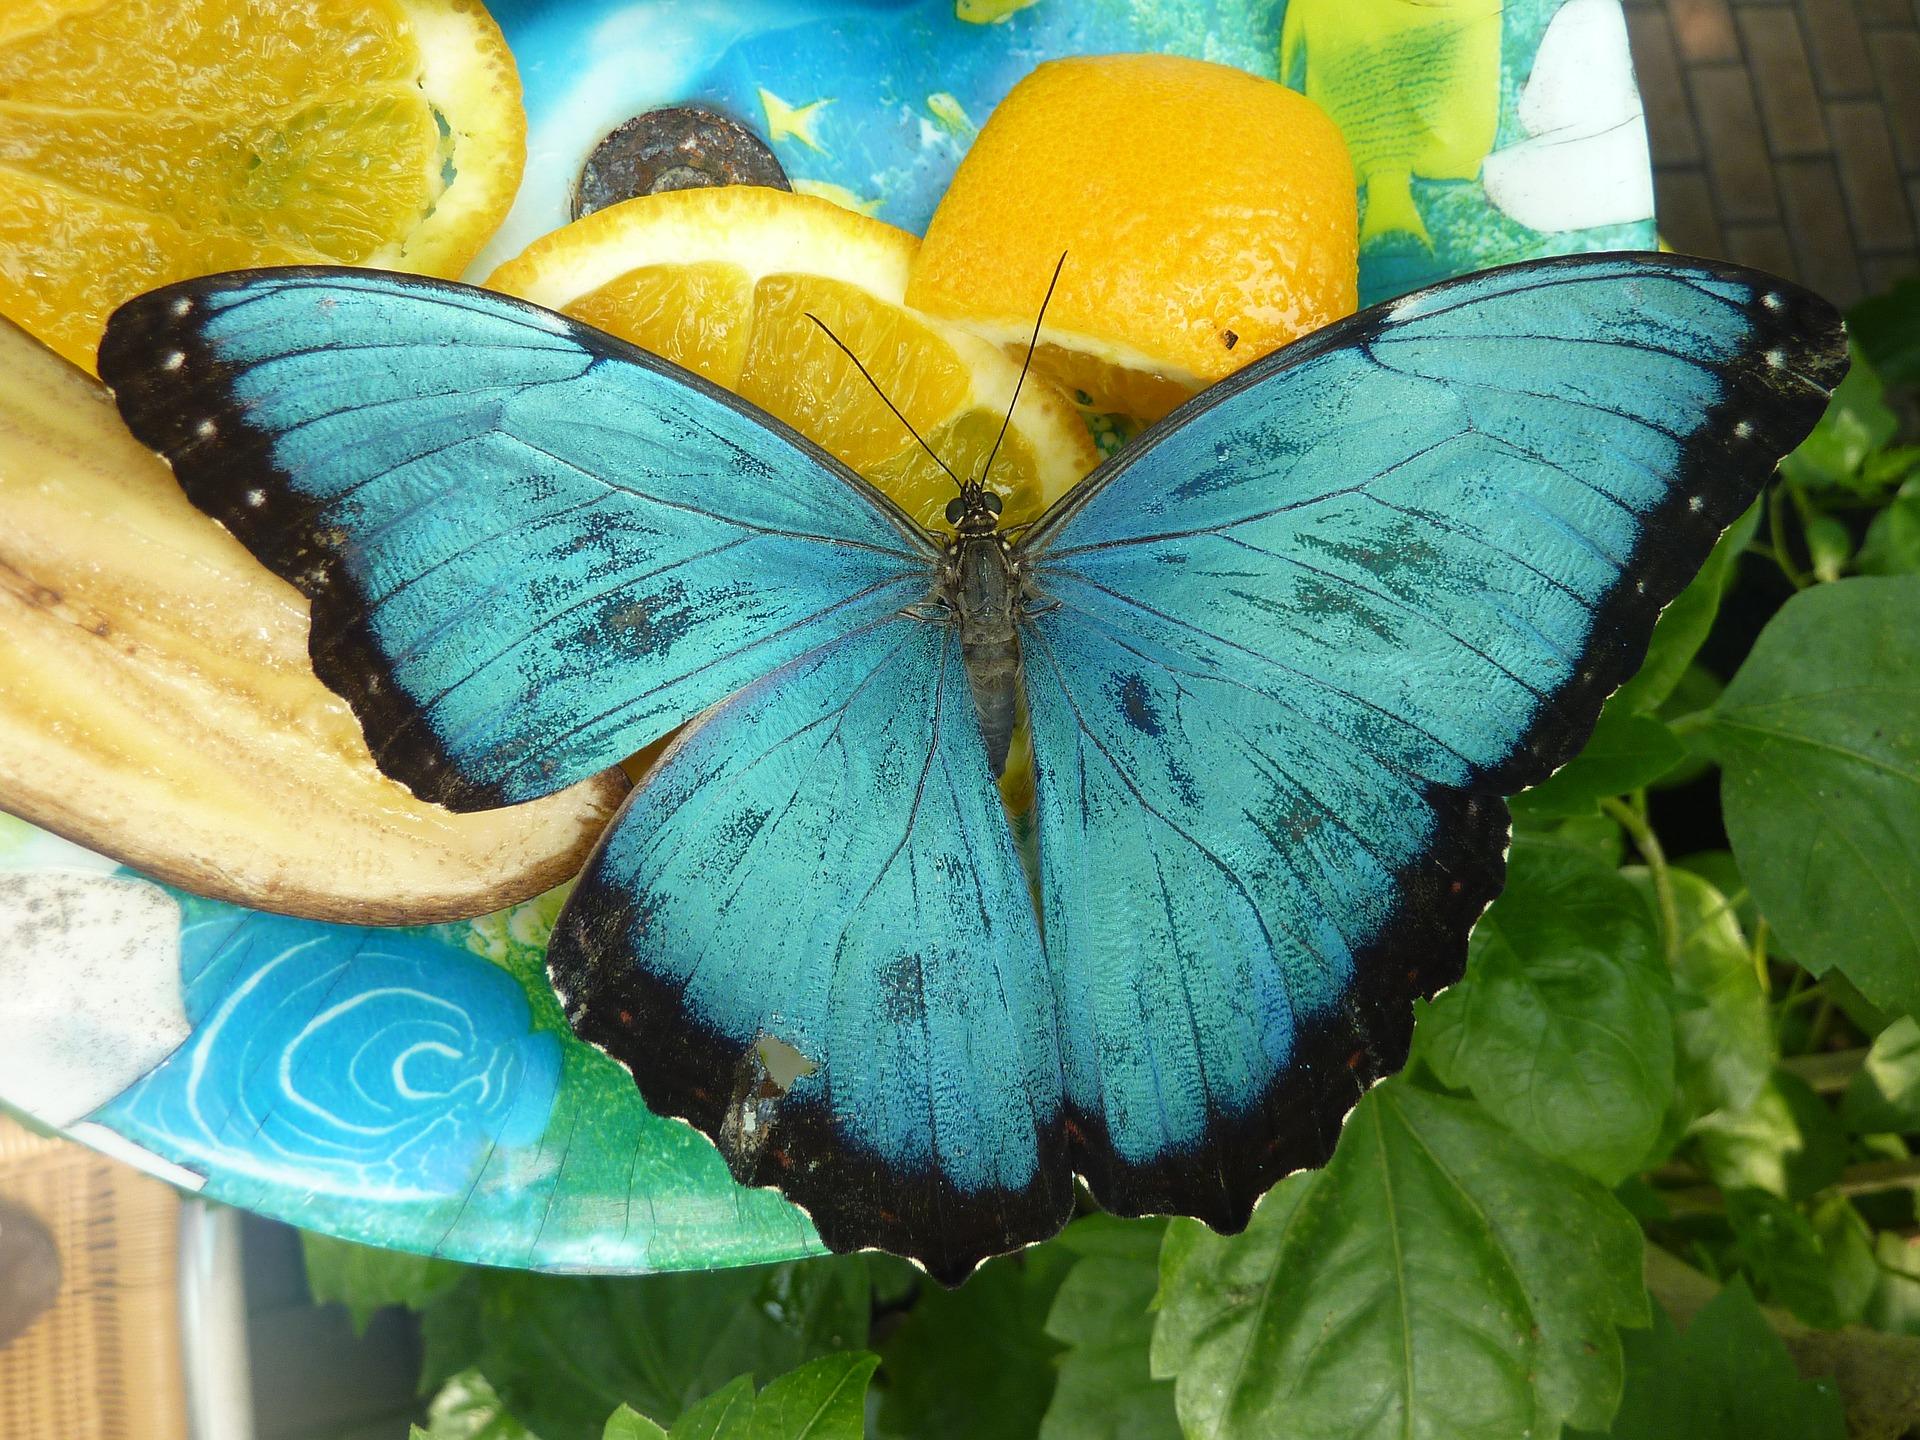 Mariposa azul nutriverssa comiendo naranja